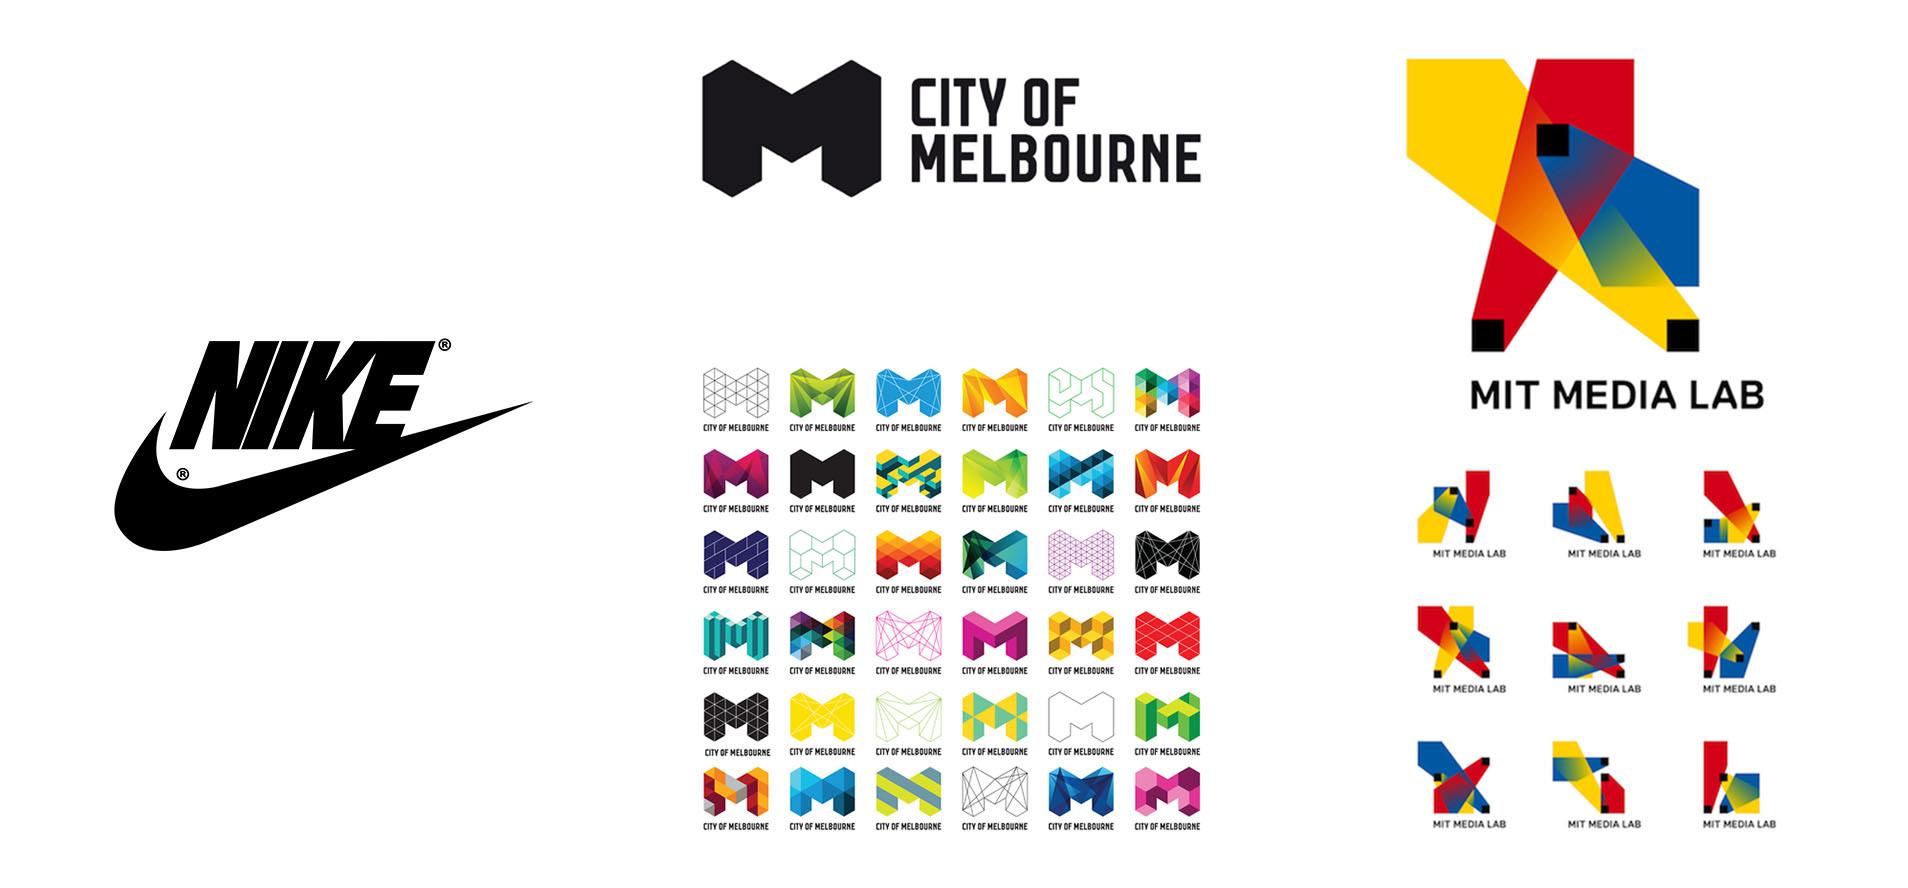 logo can be generative